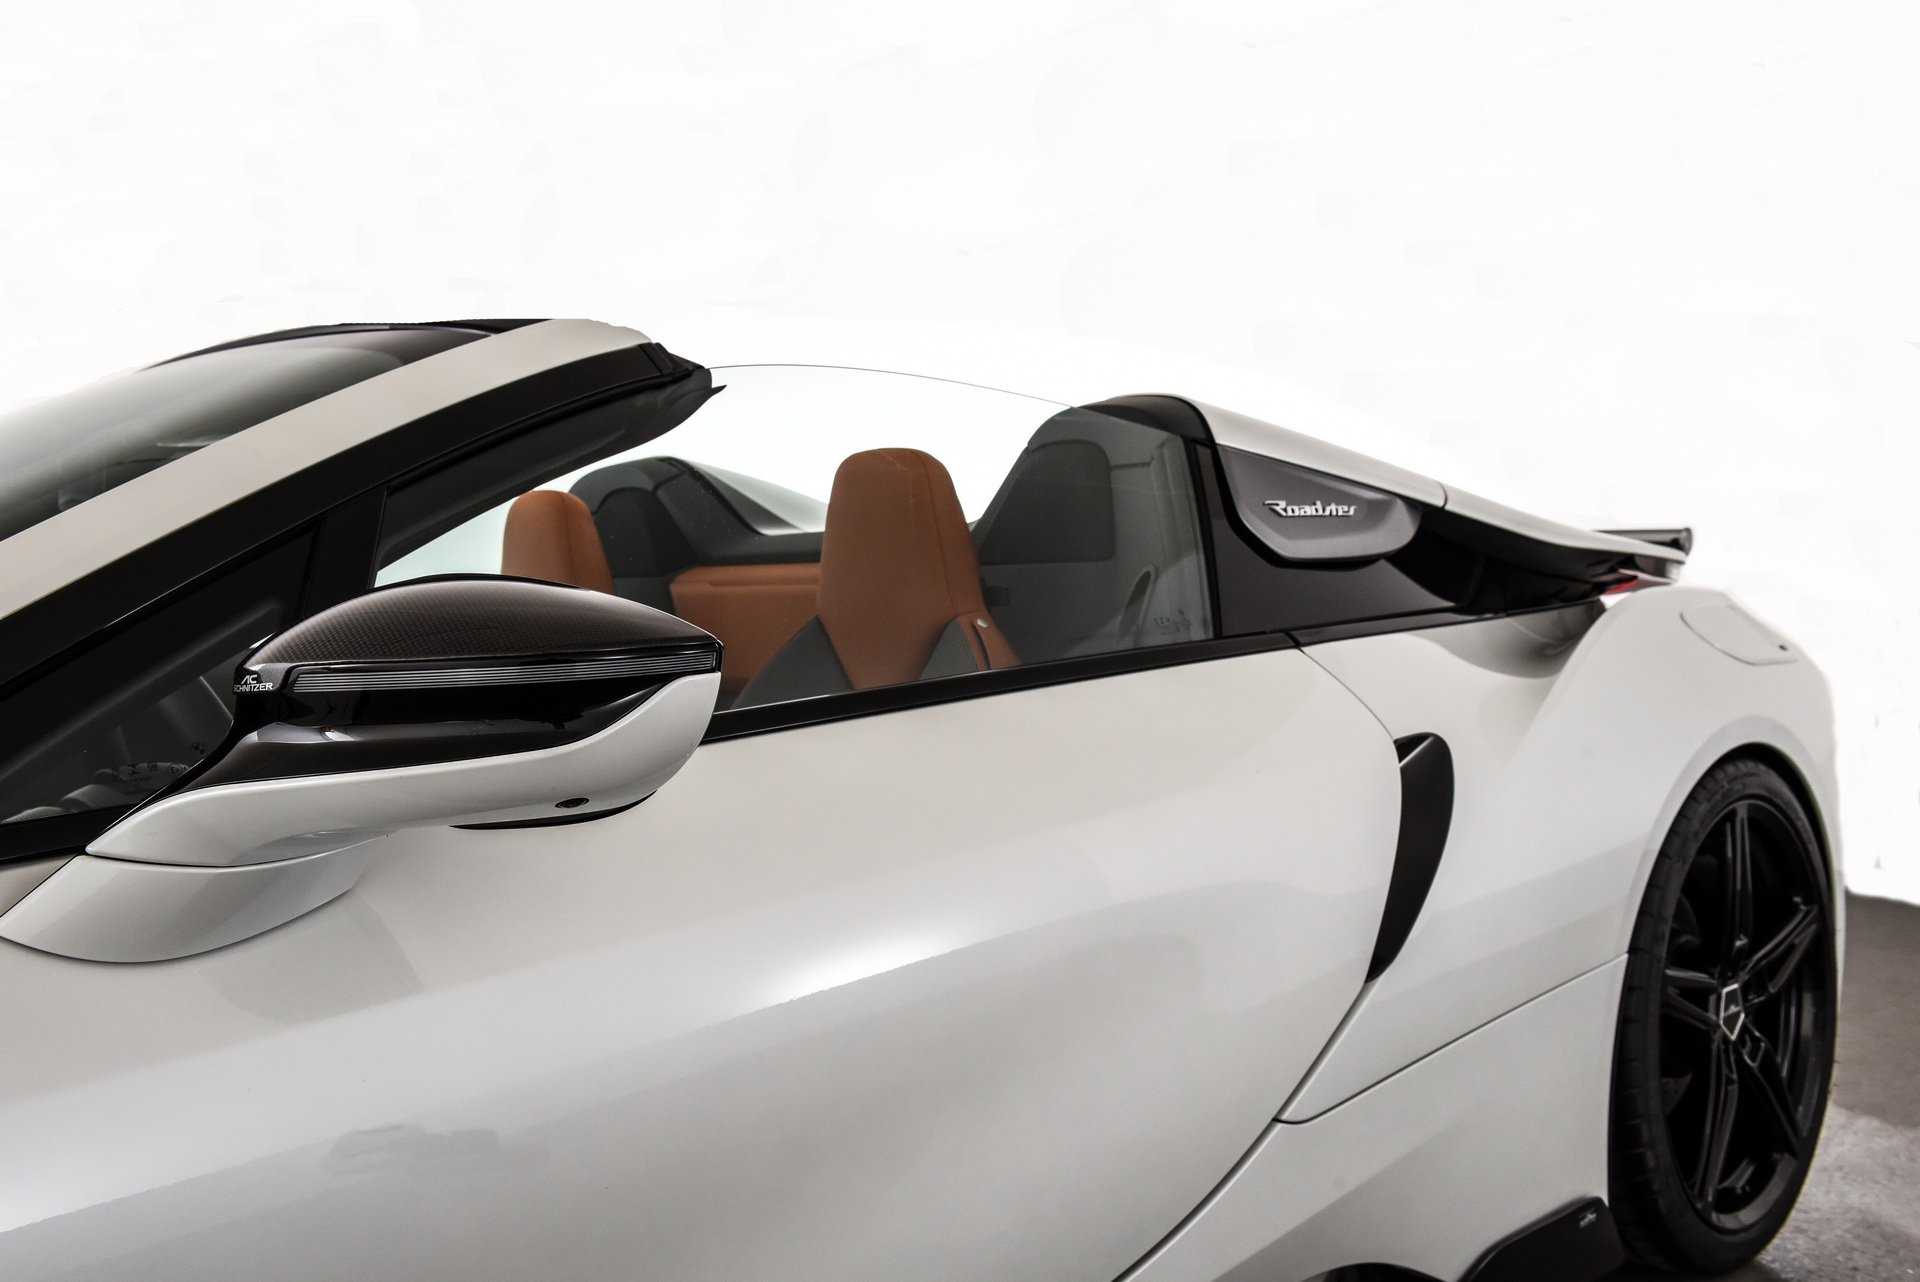 Bmw I8 Roadster Full Body Kit By Ac Schnitzer Bmw Car Tuning